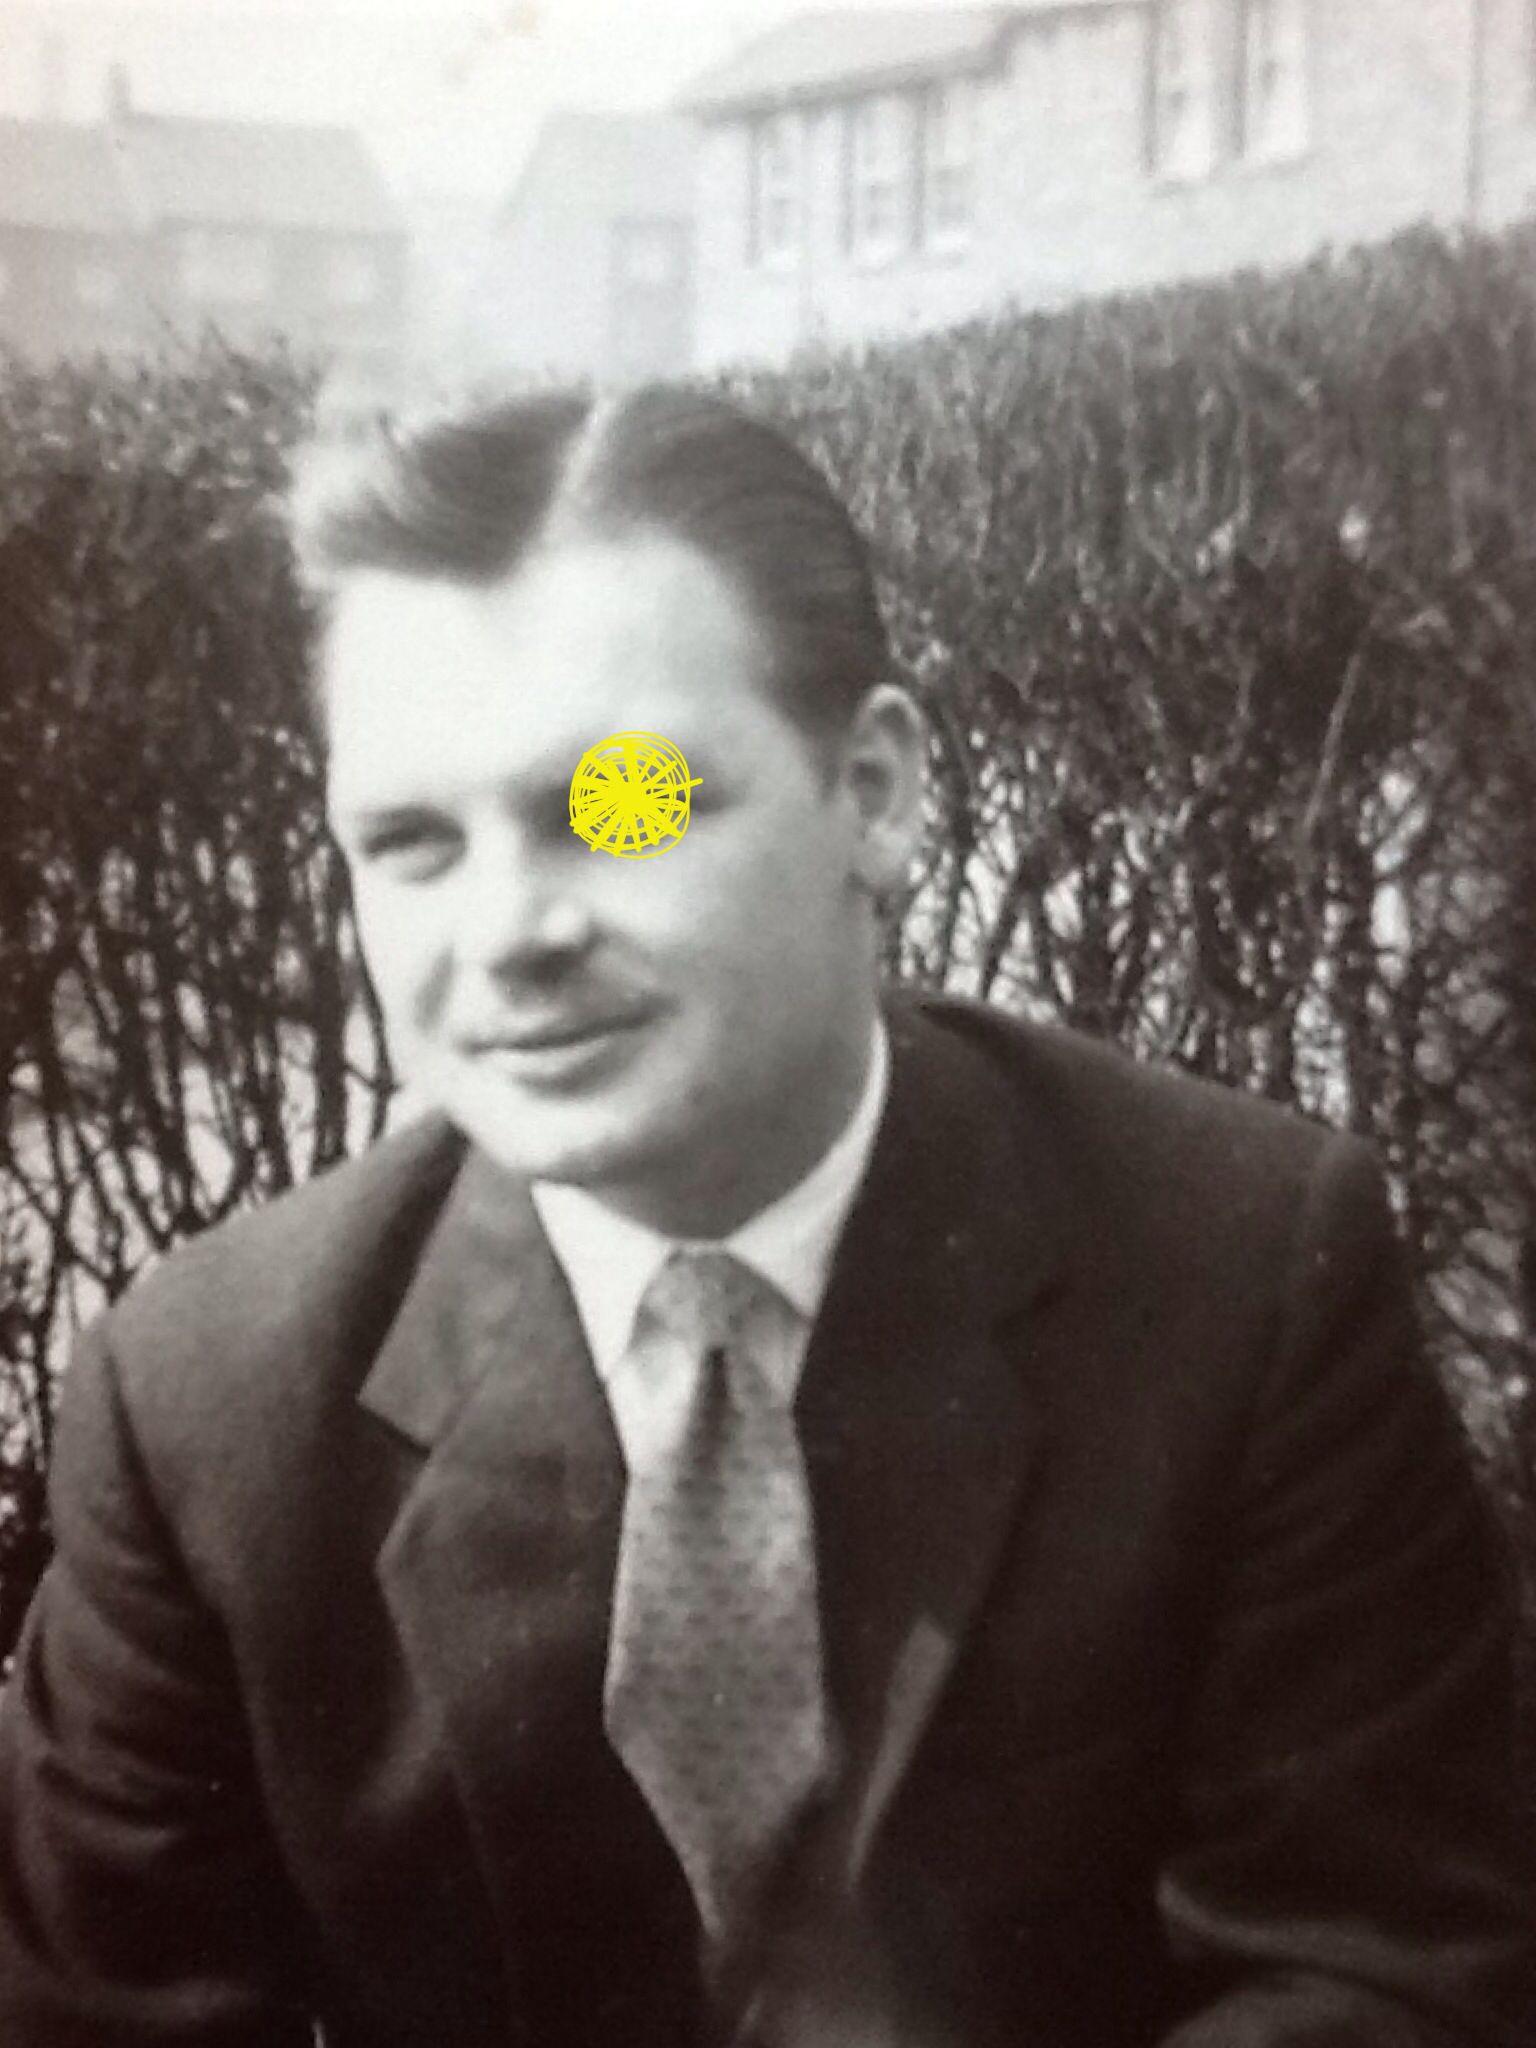 CC's emulation investigation